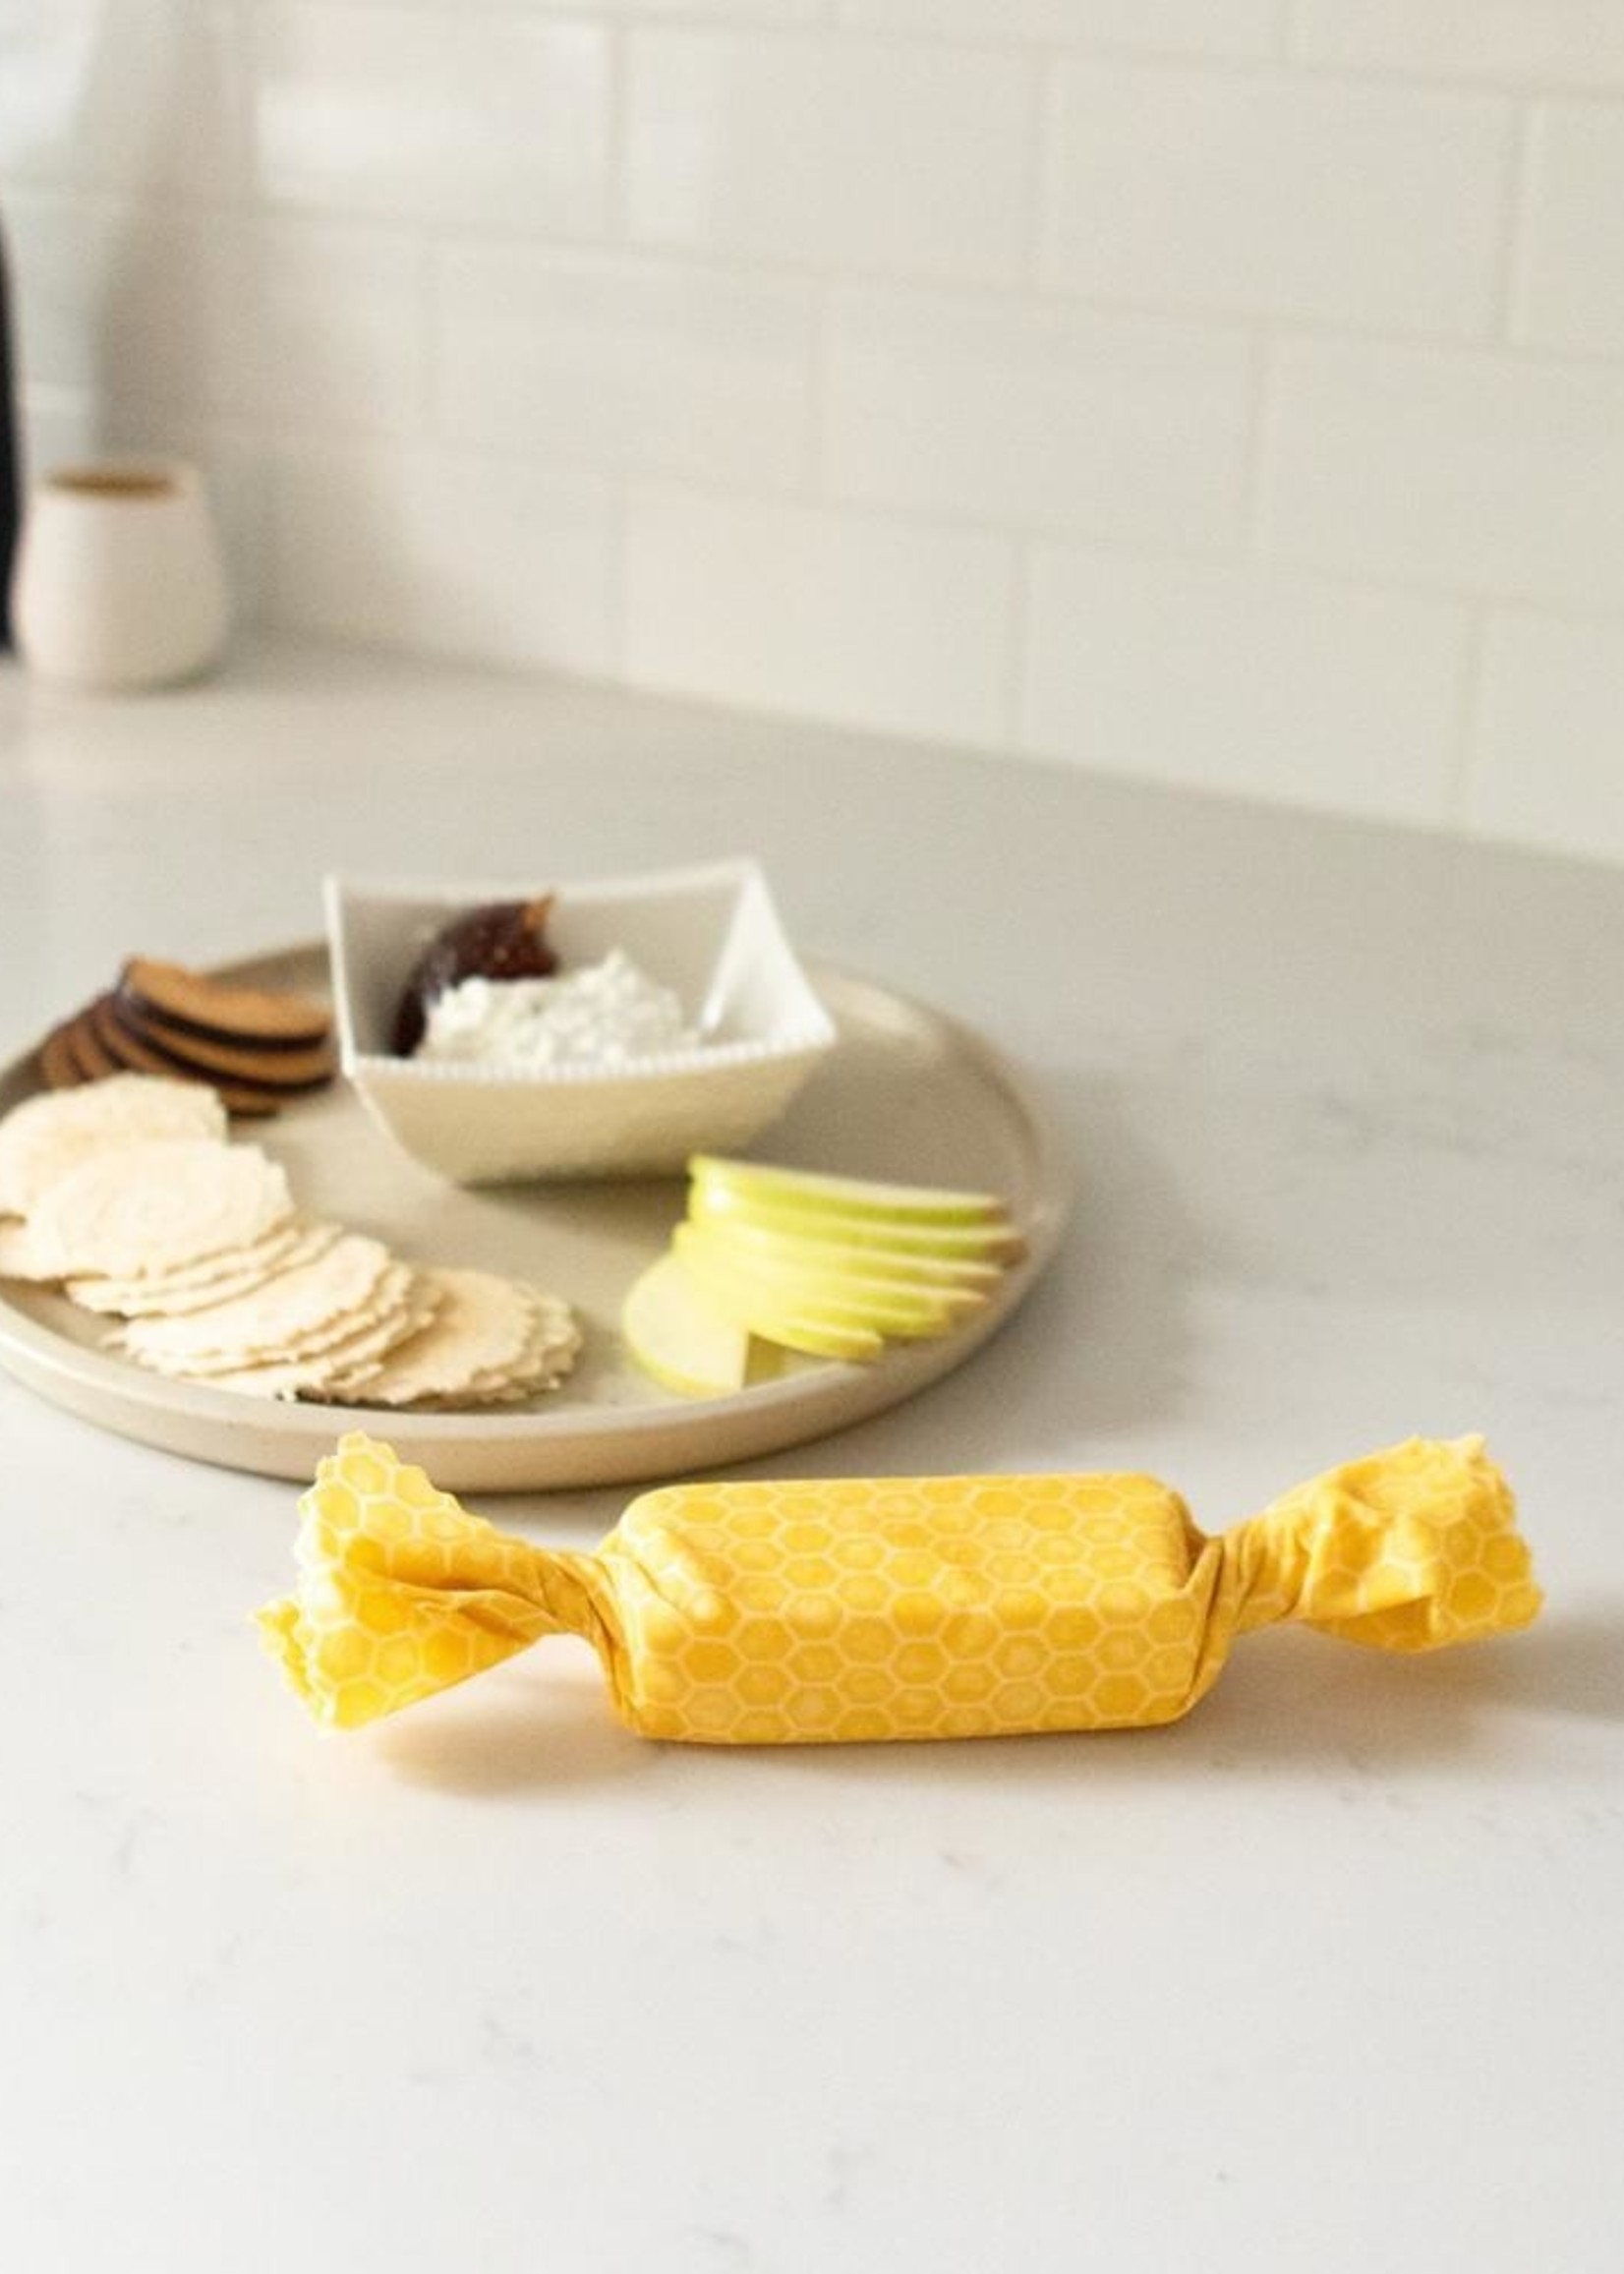 Golidilocks Sustainable Goods Goldilocks Honeybee Set 3 Beeswax Wraps